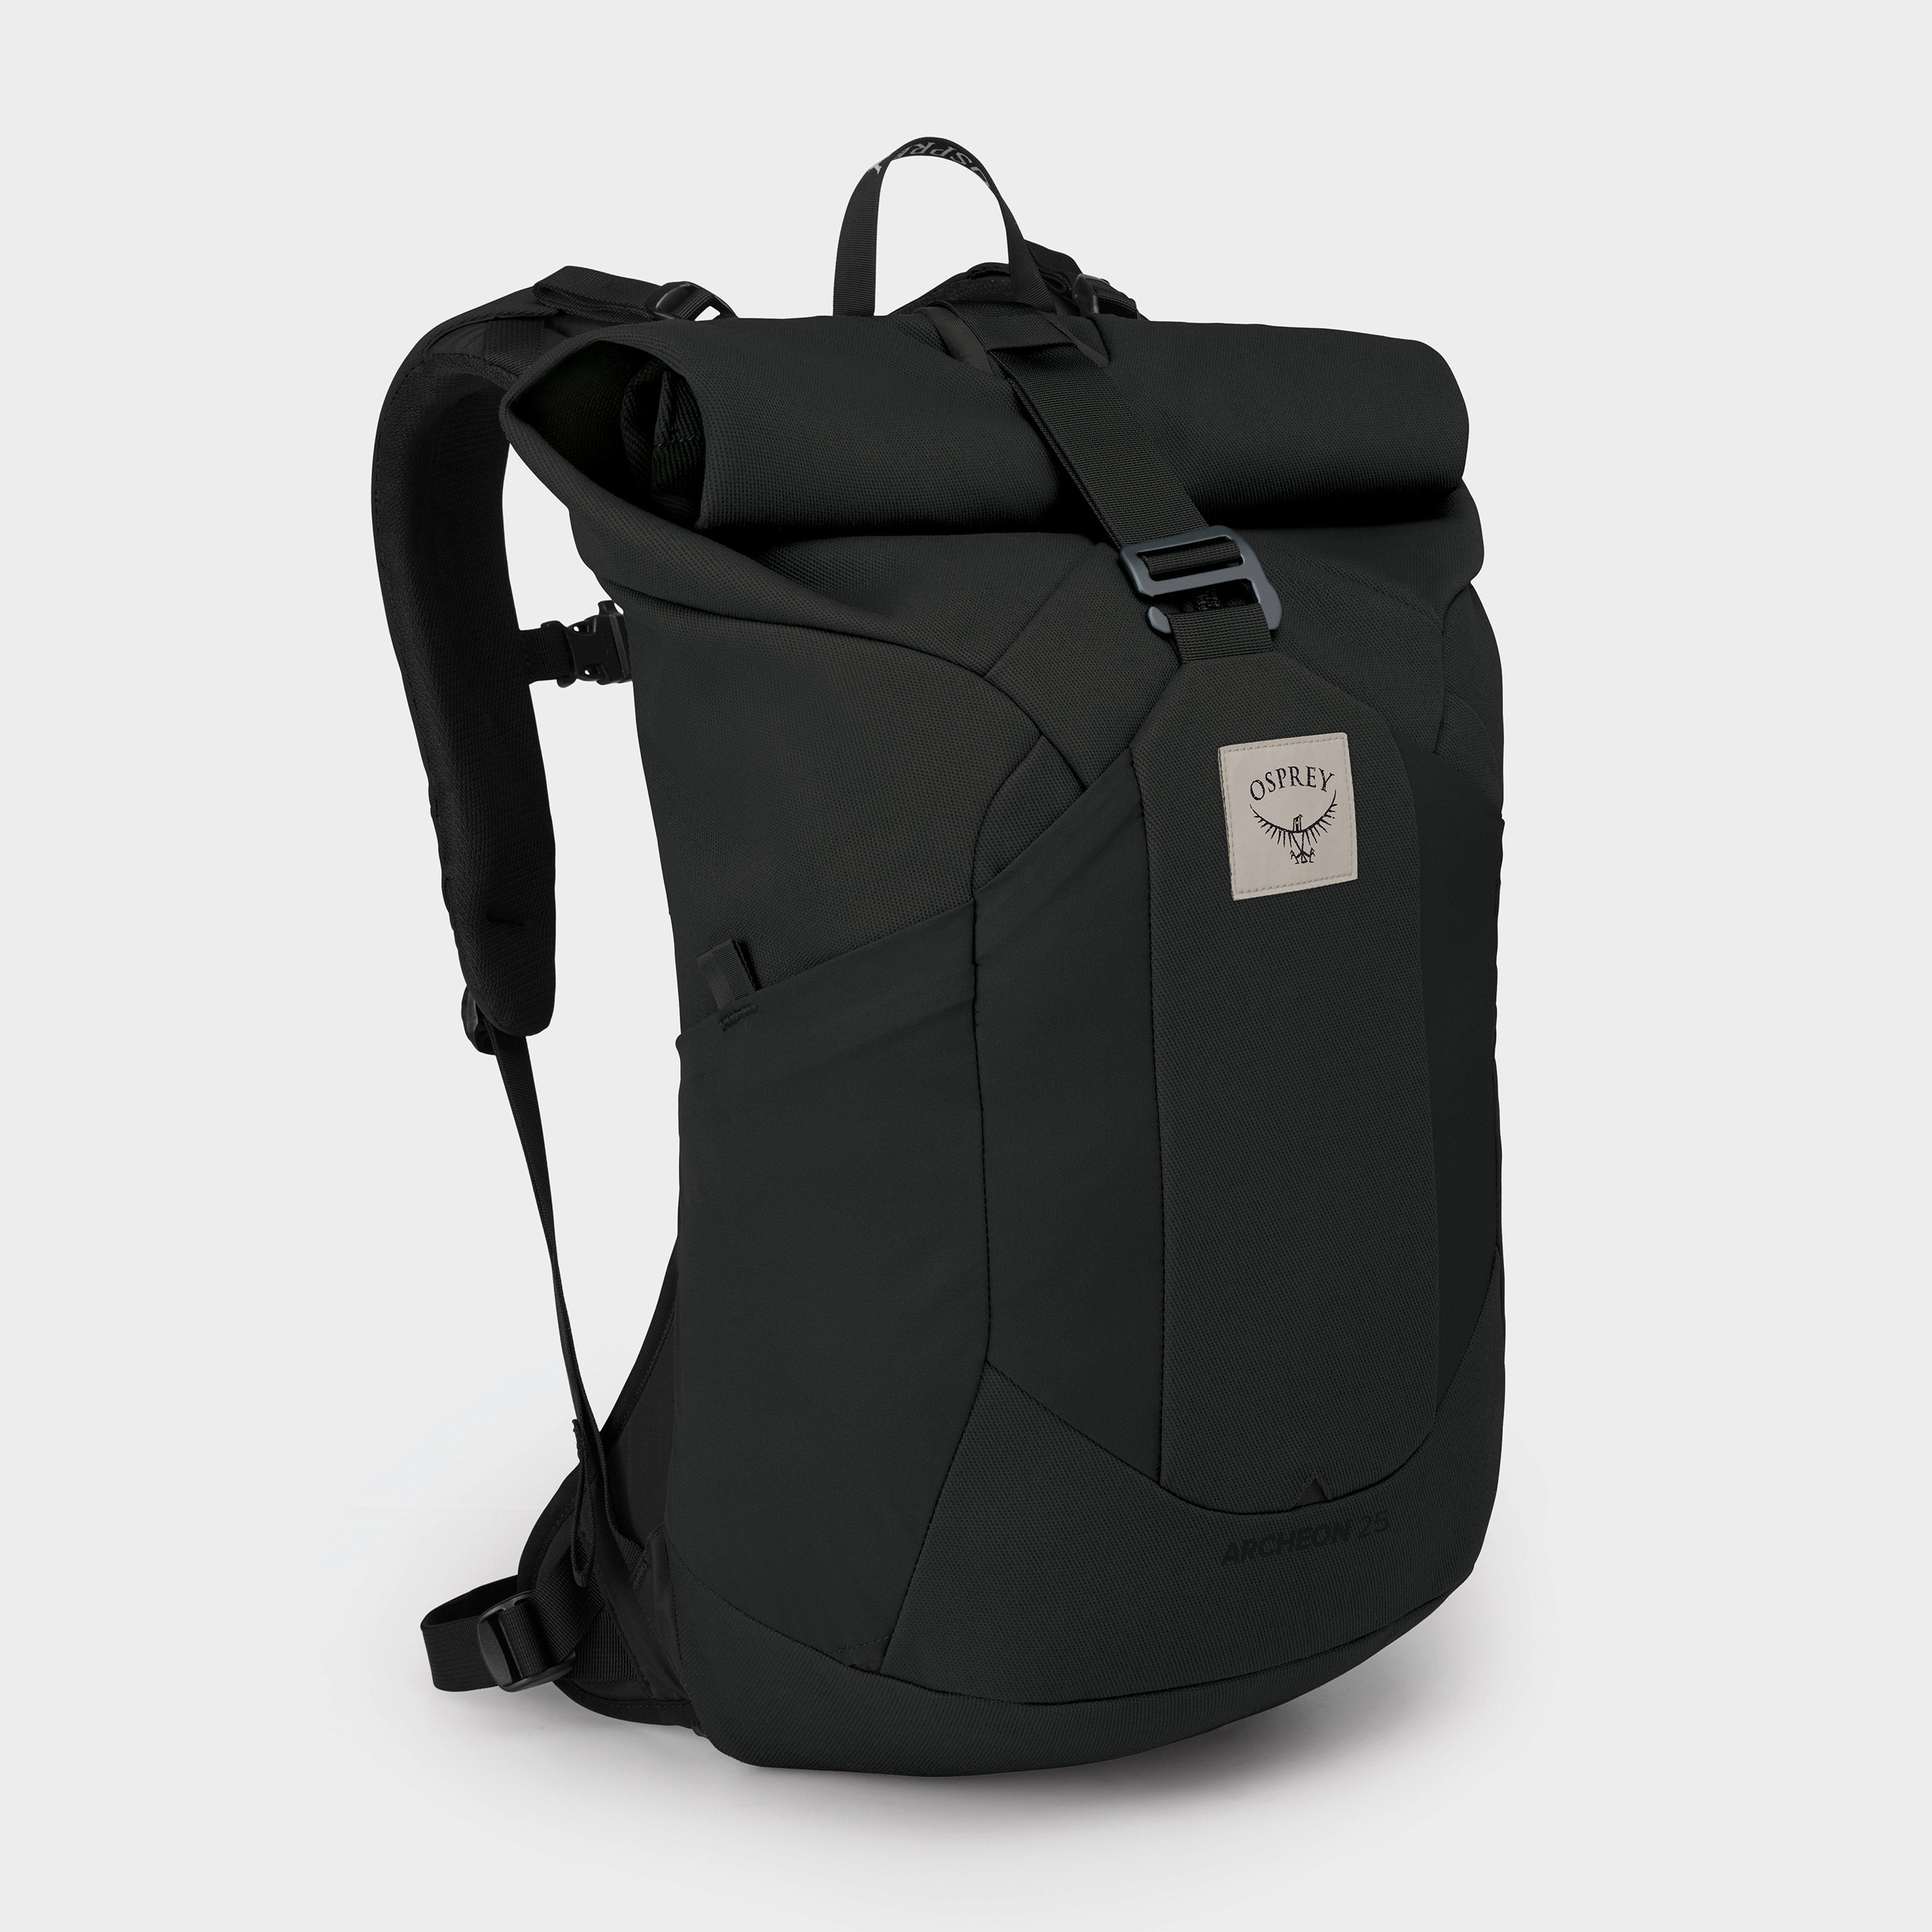 Osprey Archeon 25 Daysack - Black/Black, Black